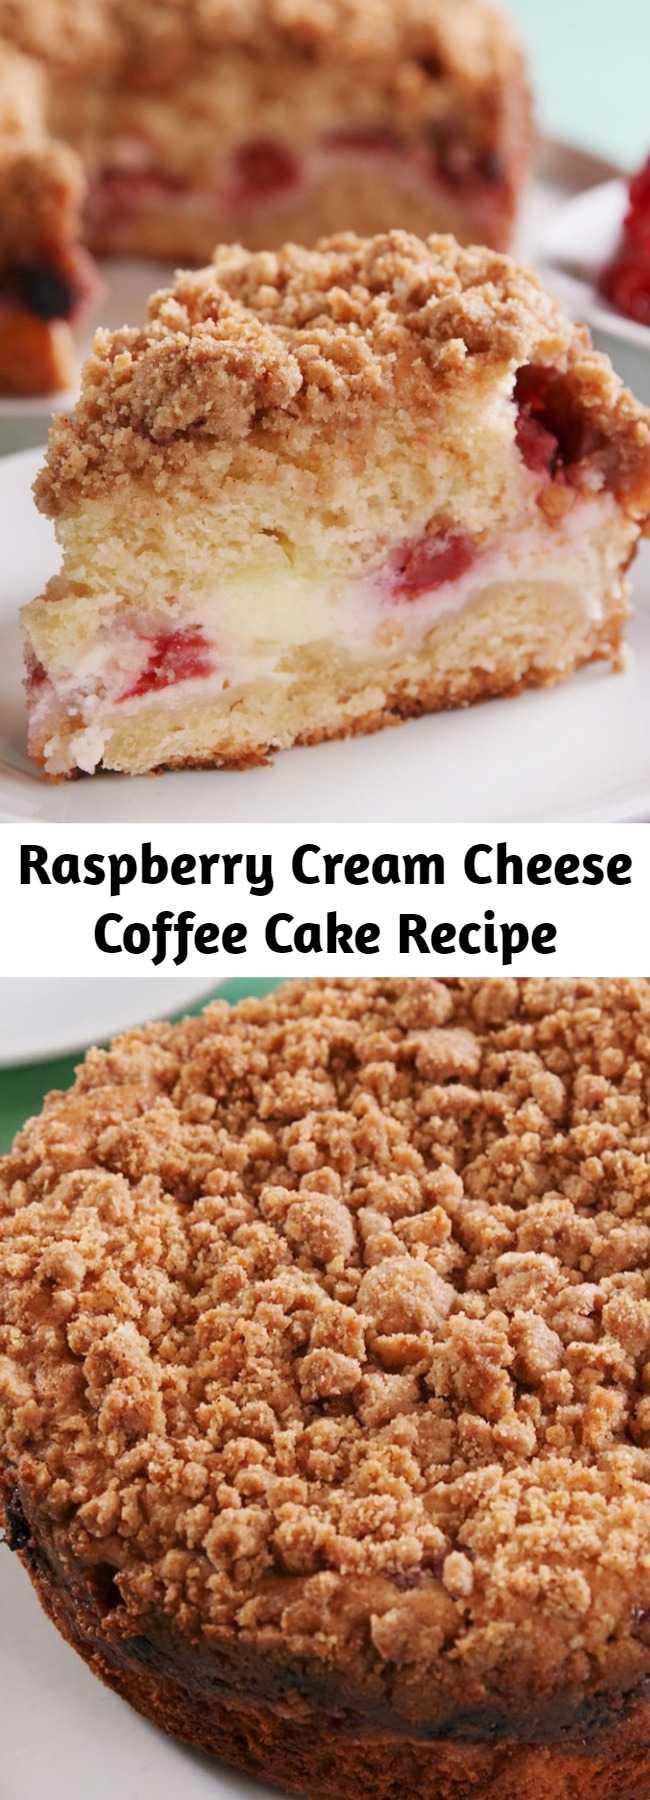 Raspberry Cream Cheese Coffee Cake Recipe - This Raspberry Cream Cheese Coffee Cake is the only coffee cake recipe you'll ever need.